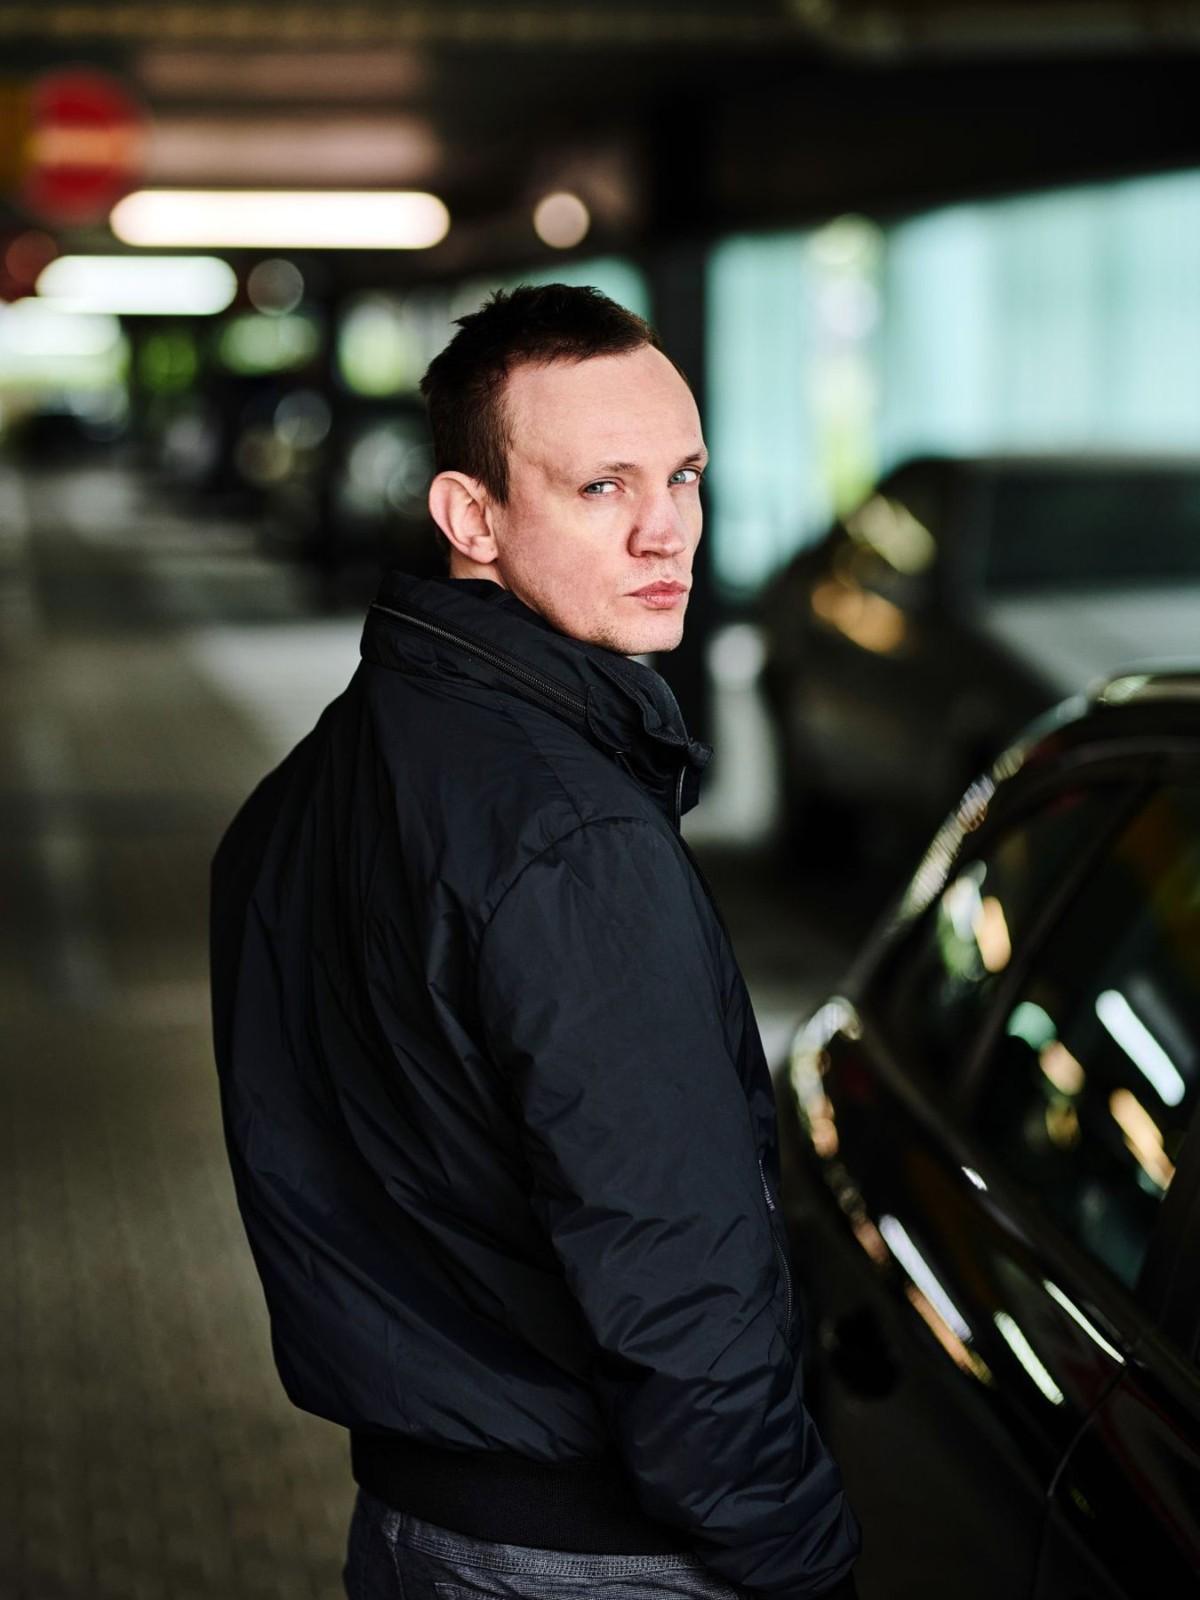 Adam Venhaus, Schauspielagentur, Actors Agency Osman